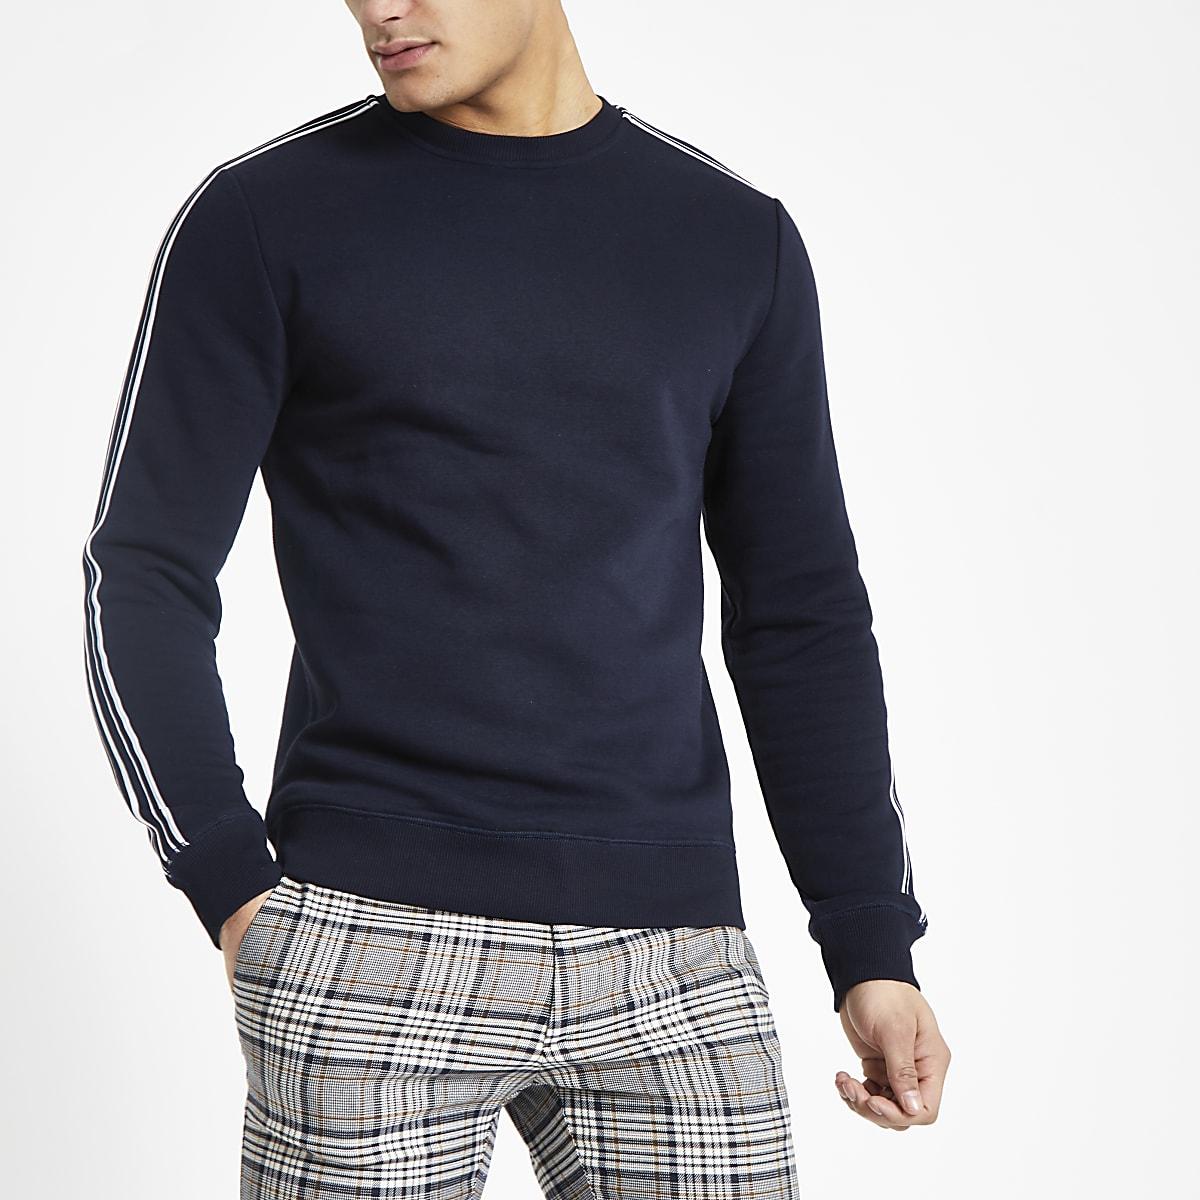 Navy tape slim fit crew neck sweatshirt